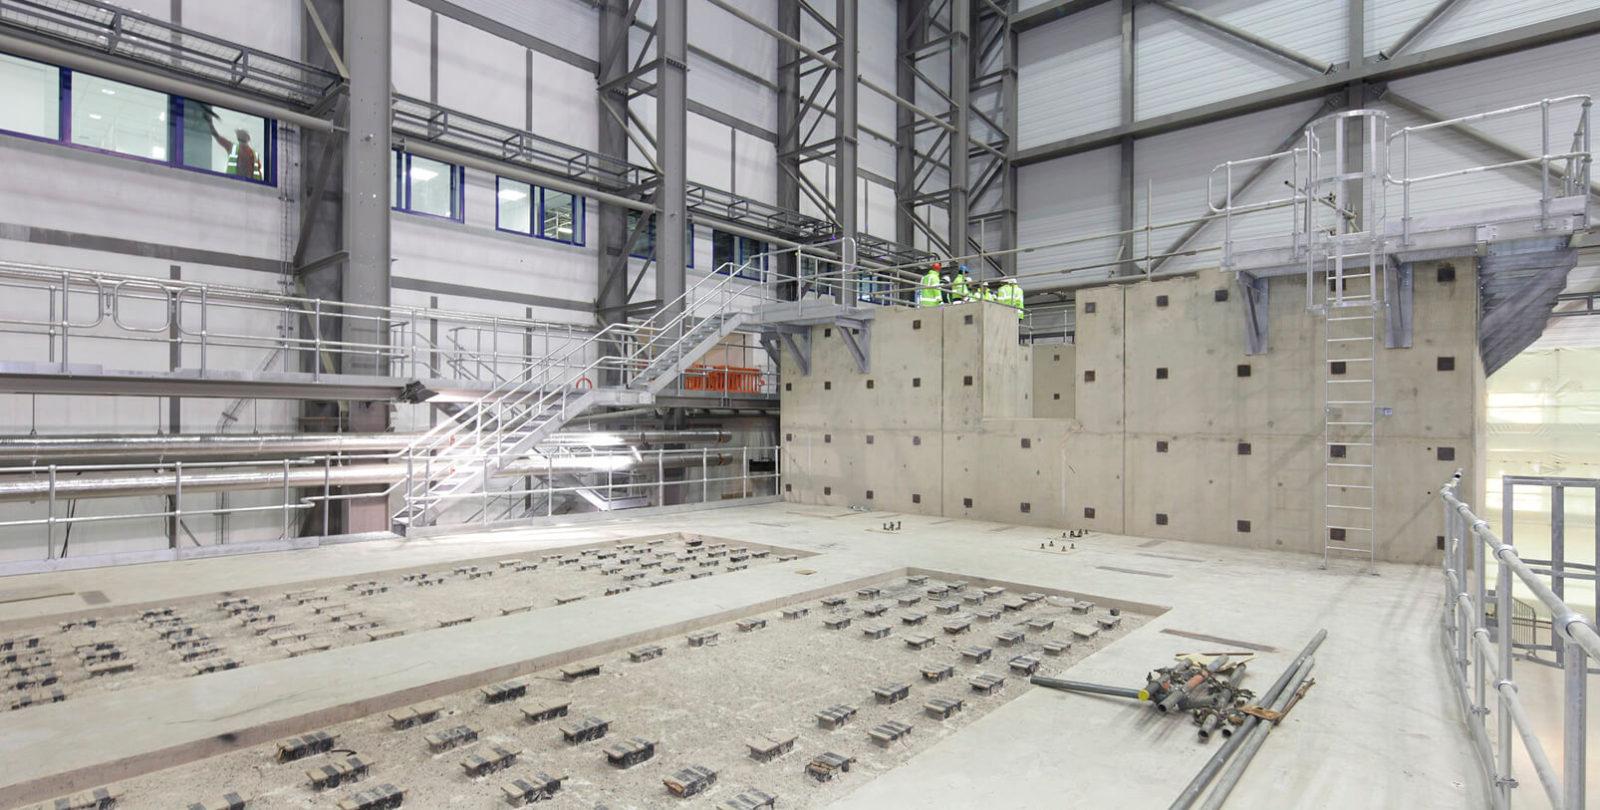 NAREC_FUJIN_Wind_Turbine_Drive_Train_Test_Facility_UK_ADA_Idom_1_